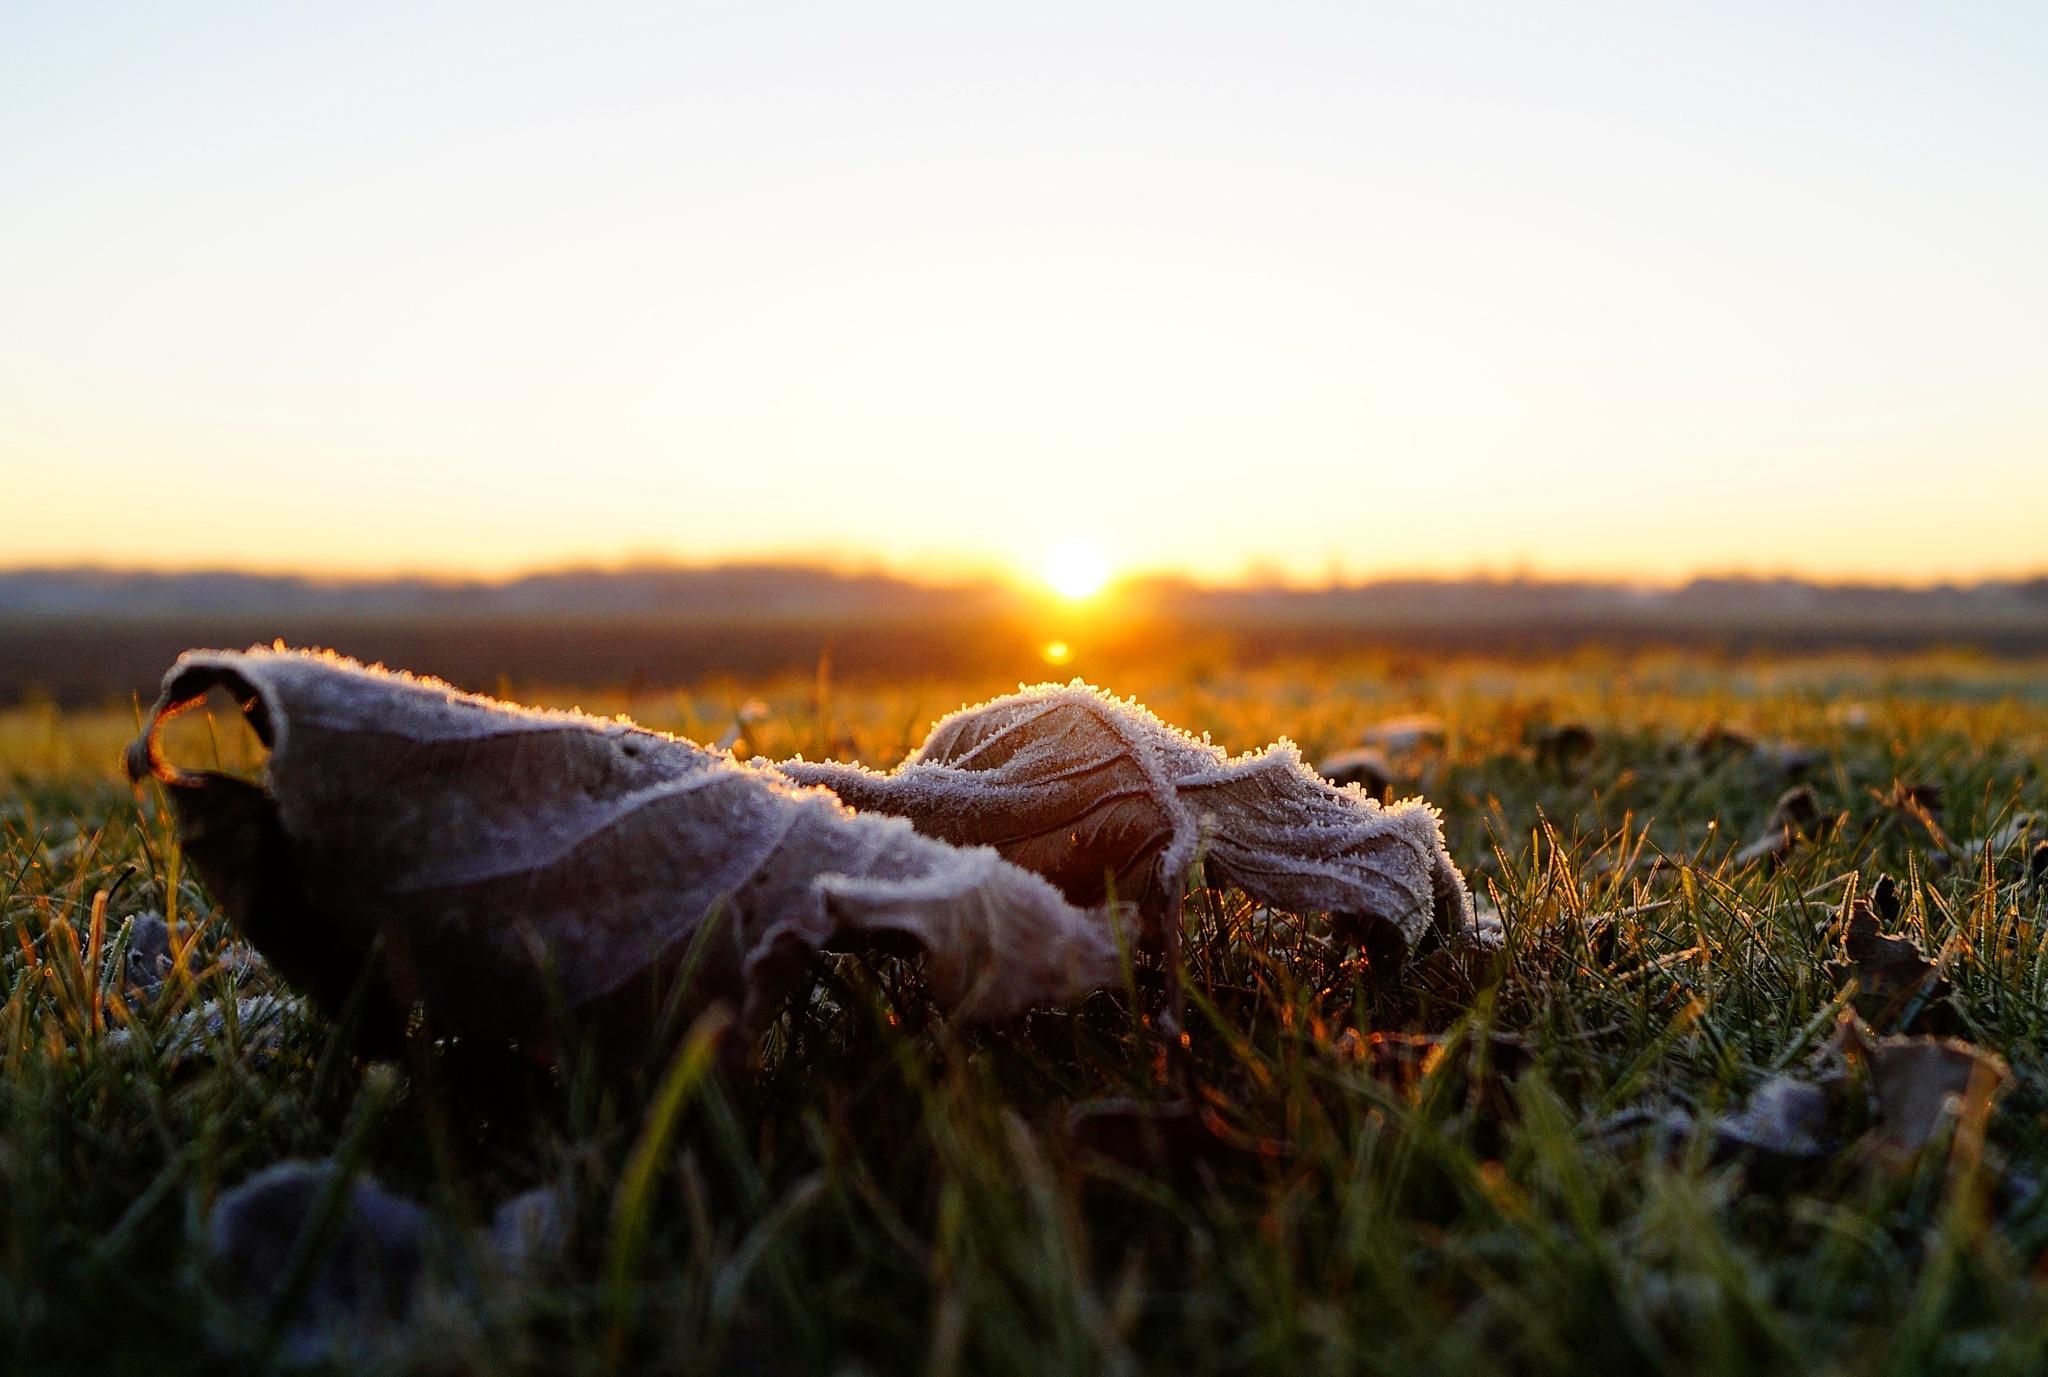 Frosty Sunrise by Marian Baay